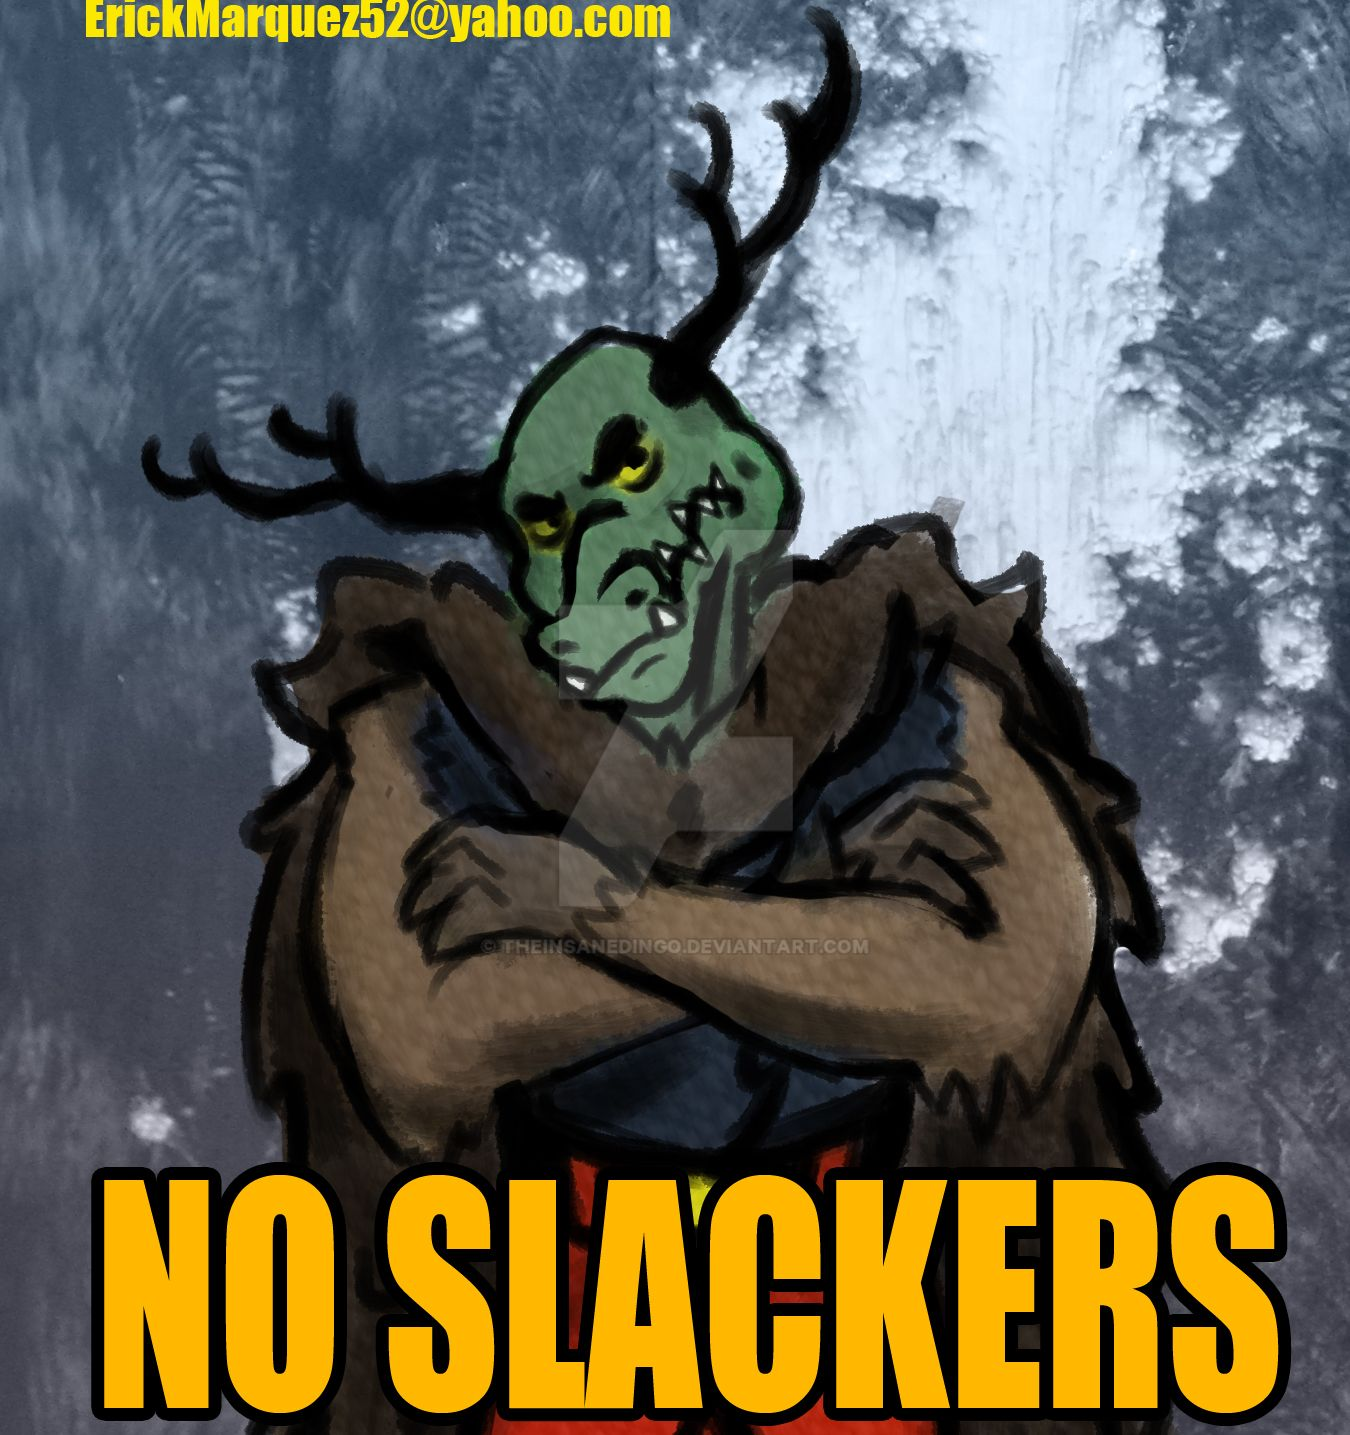 No Slackers by TheInsaneDingo